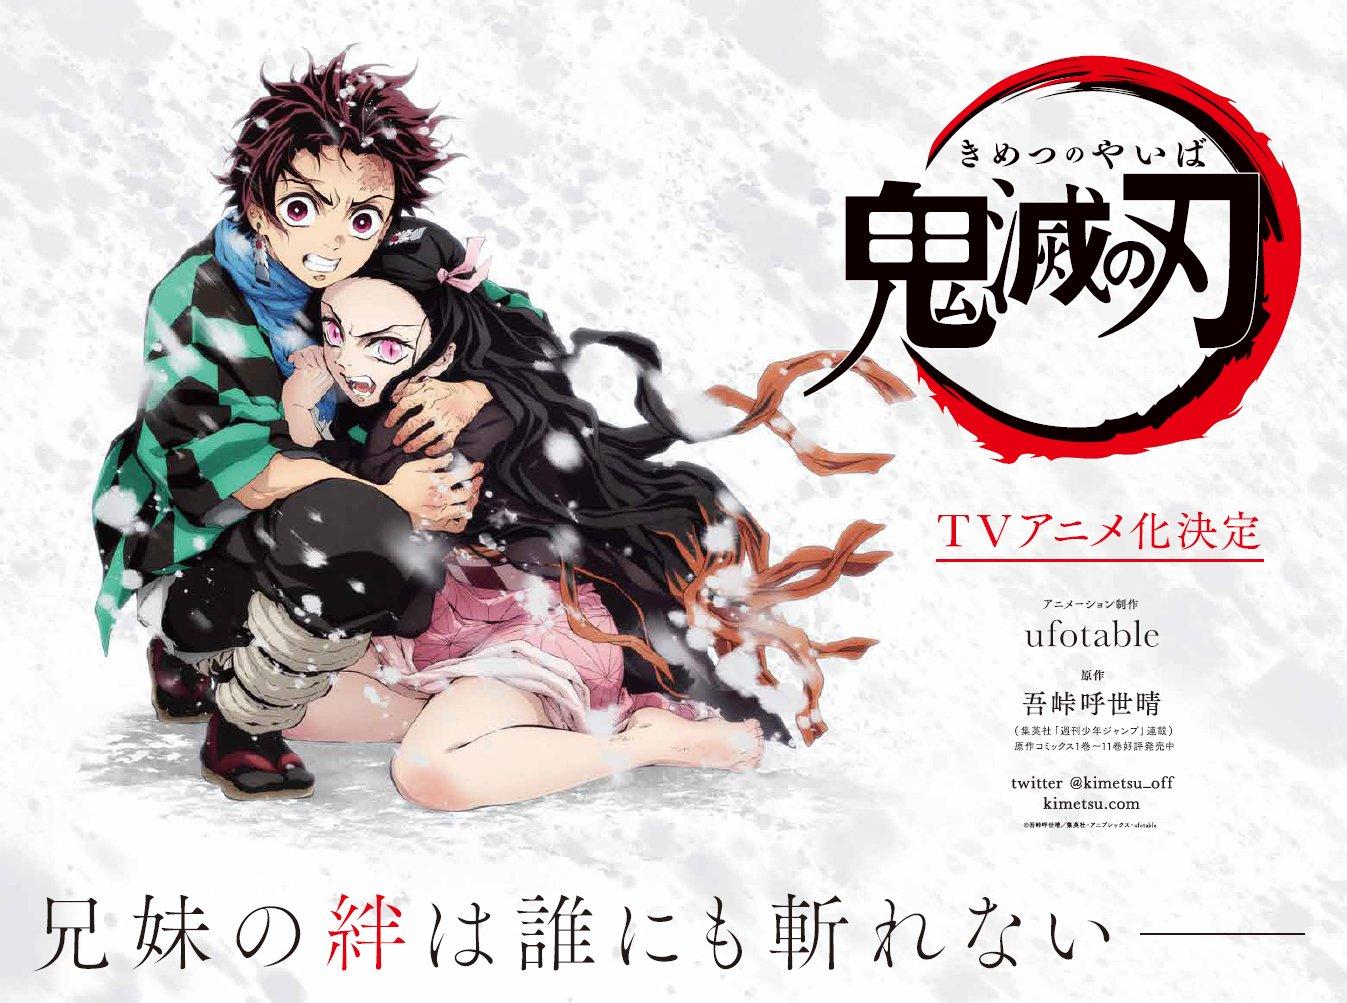 JUMP漫画《鬼灭之刃》确定TV动画化,宣传PV公开-ANICOGA